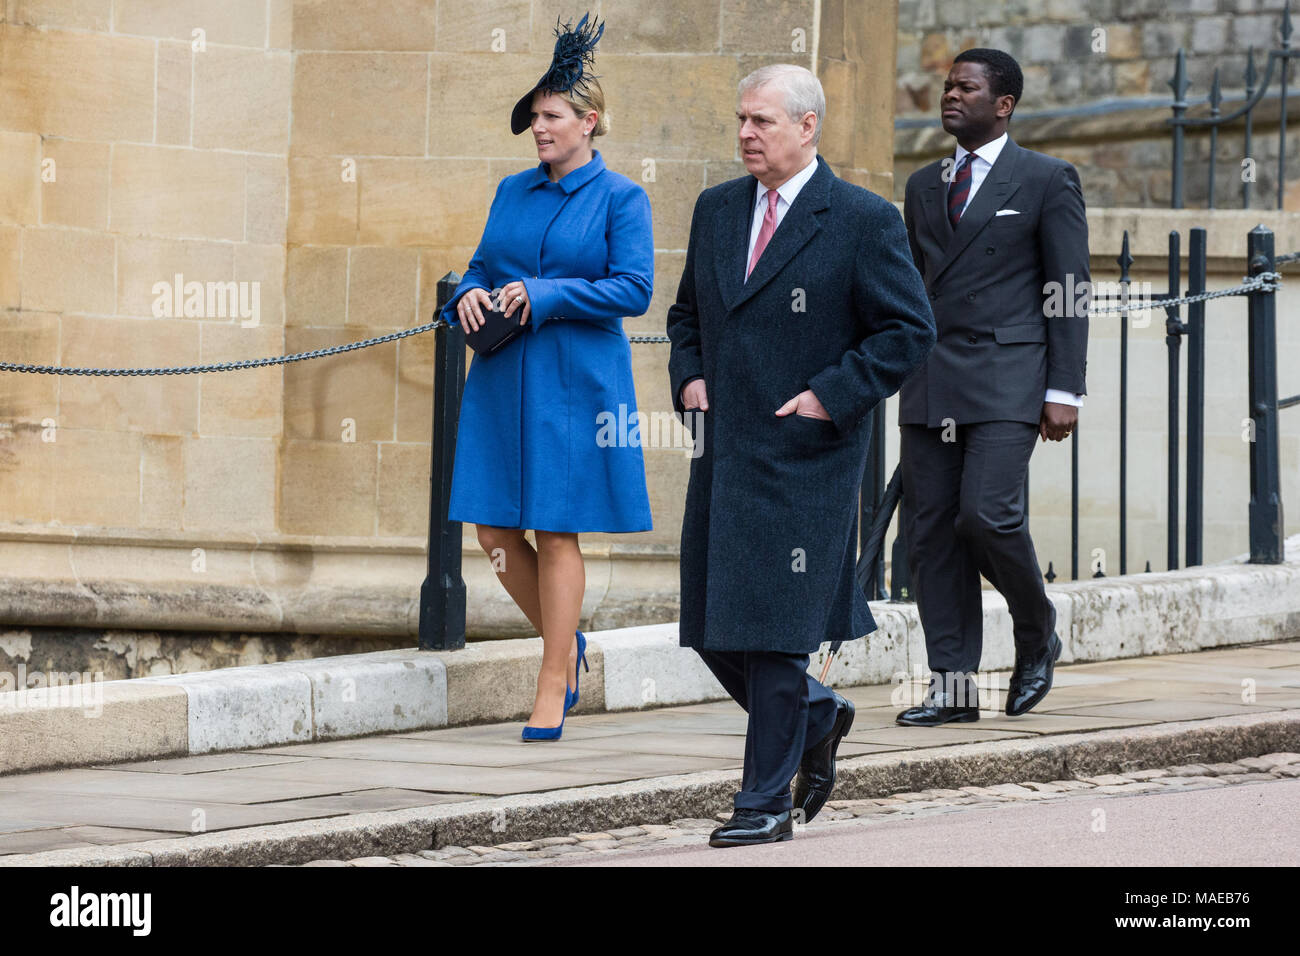 Windsor, UK. 1st April, 2018. Prince Andrew, the Duke of York, arrives to attend the Easter Sunday service at St George's Chapel in Windsor Castle alongside Zara Tindall. Credit: Mark Kerrison/Alamy Live News - Stock Image